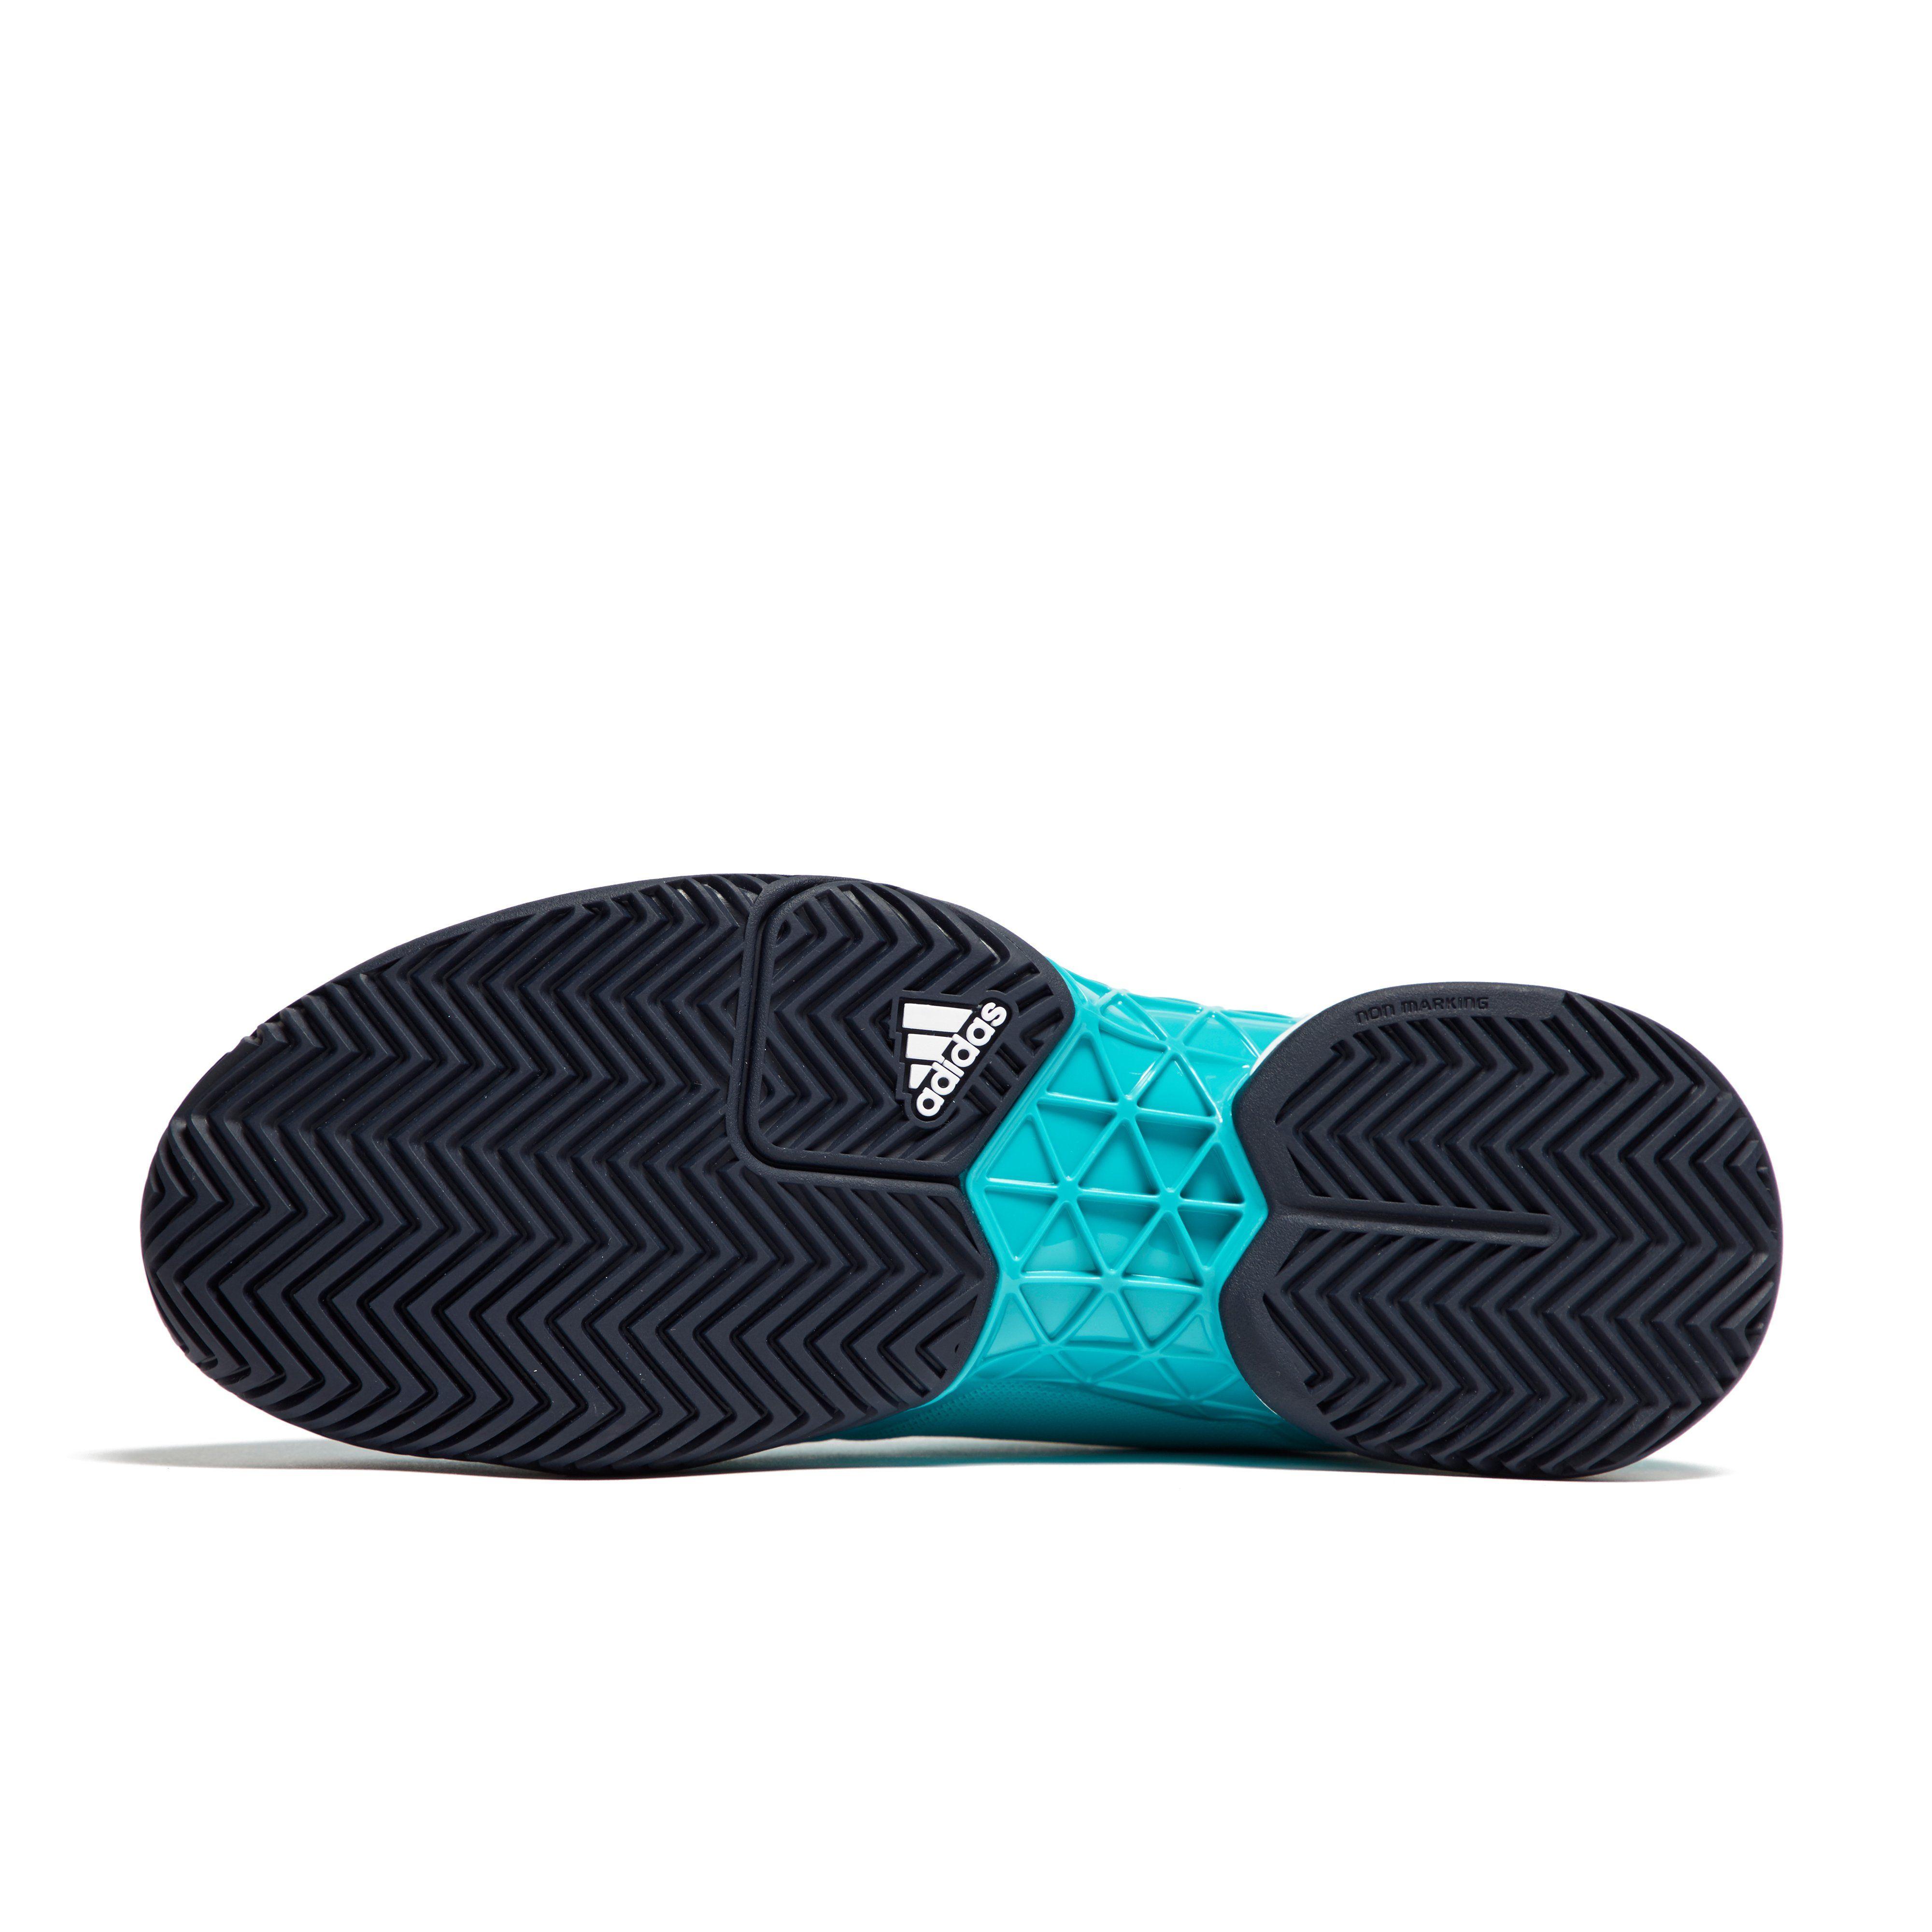 adidas Barricade 2018 Men's Tennis Shoes